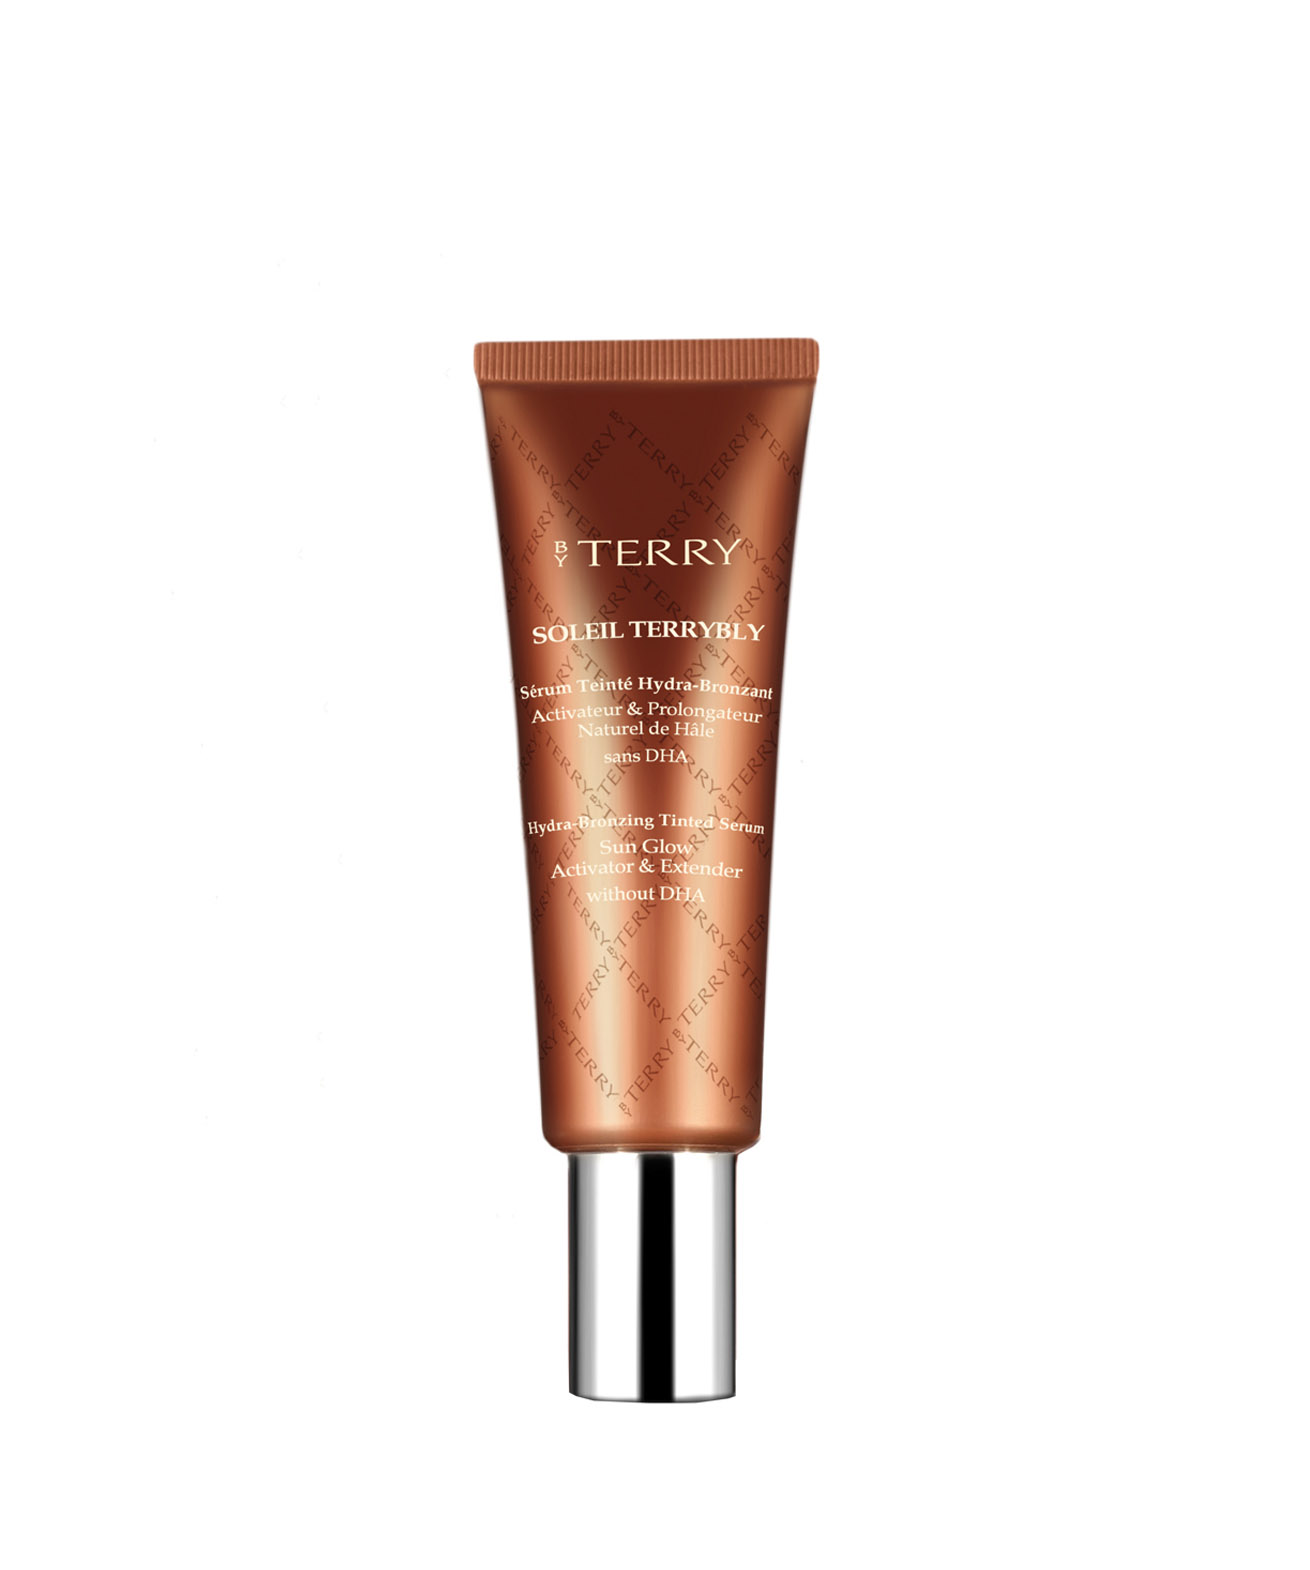 2-Soleil-Terrybly-Serum-siero-colorato-abbronzante-Linea-makeup-di-nicchia-By-Terry-Dispar-SpA.jpg